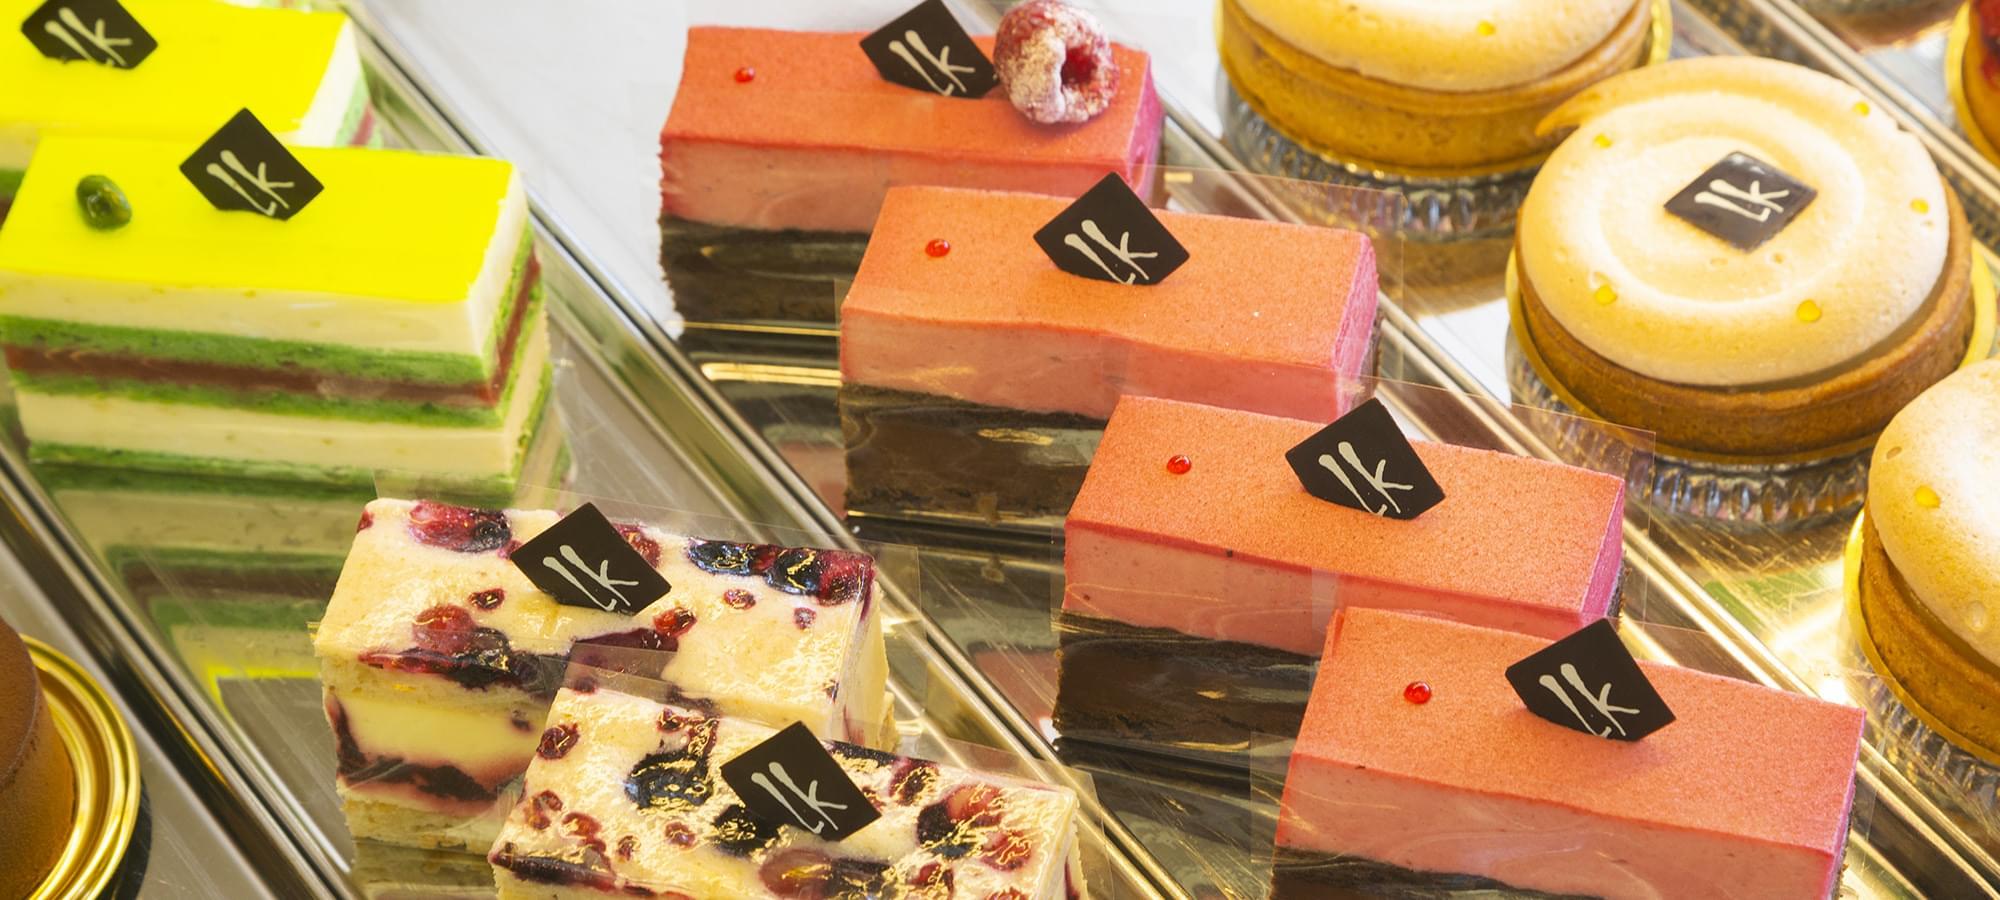 Pâtisserie Laurent Kieny